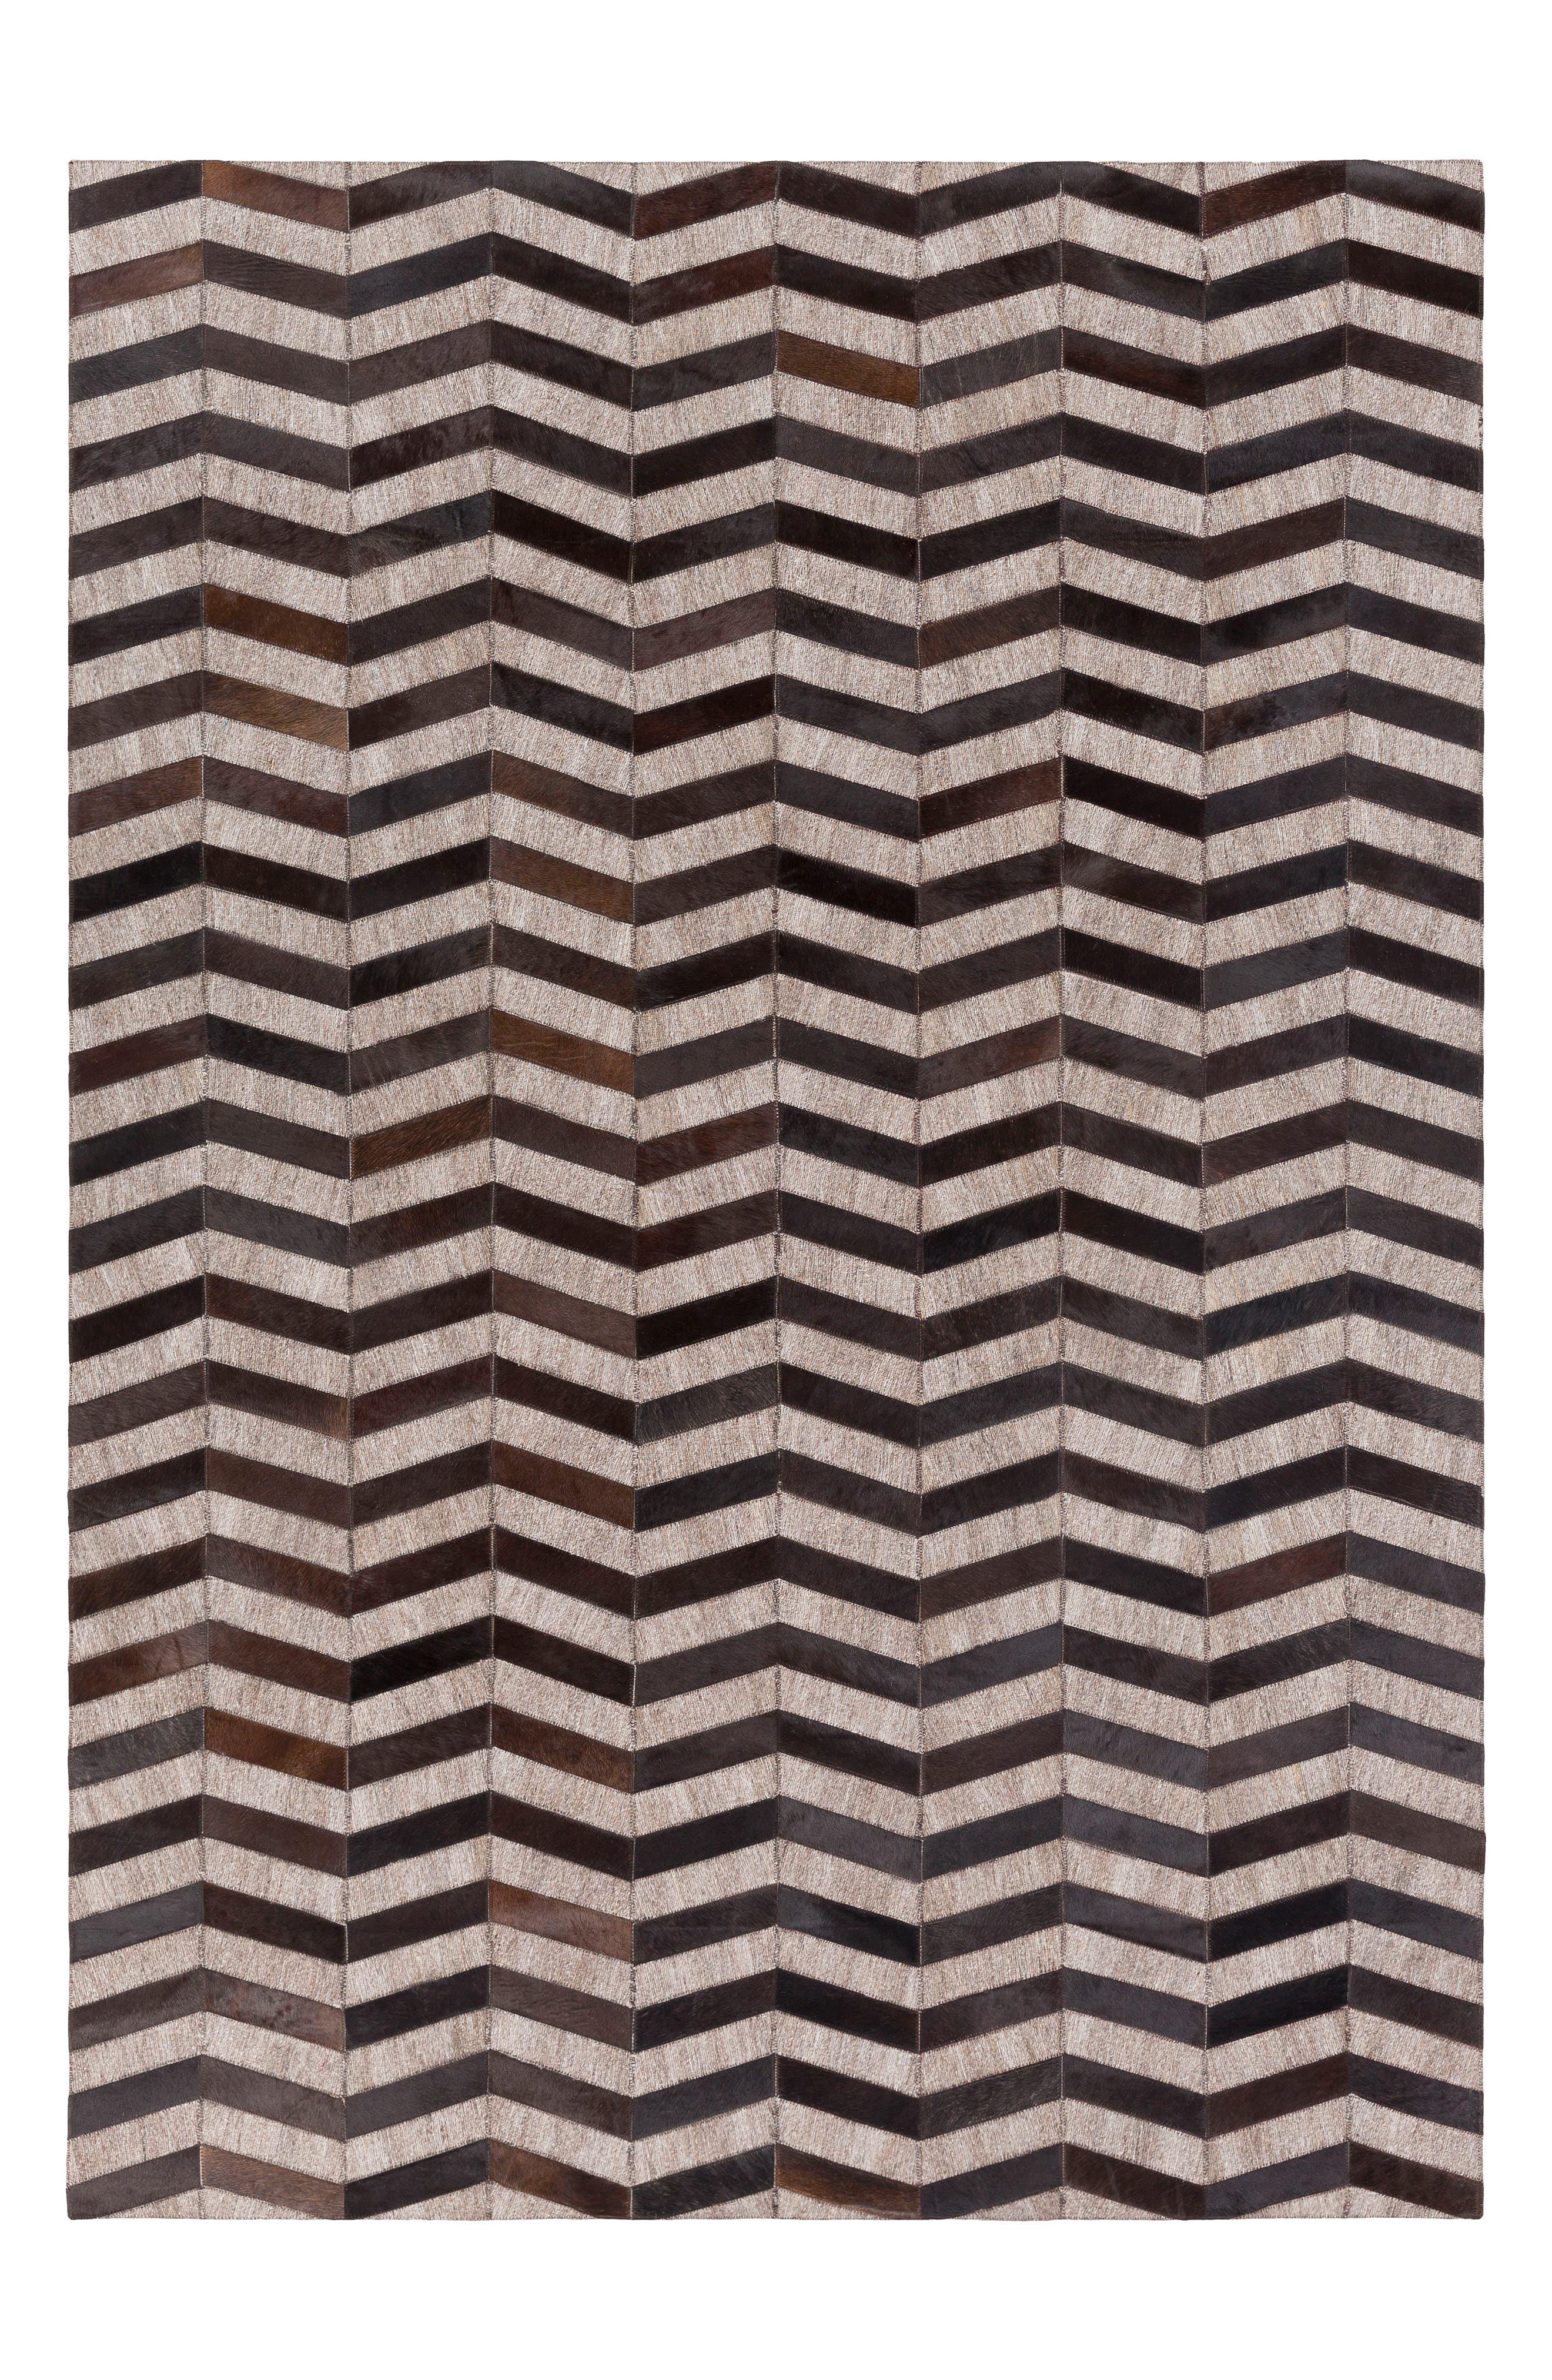 Medora Chevron Genuine Calf Hair Rug,                         Main,                         color, 001